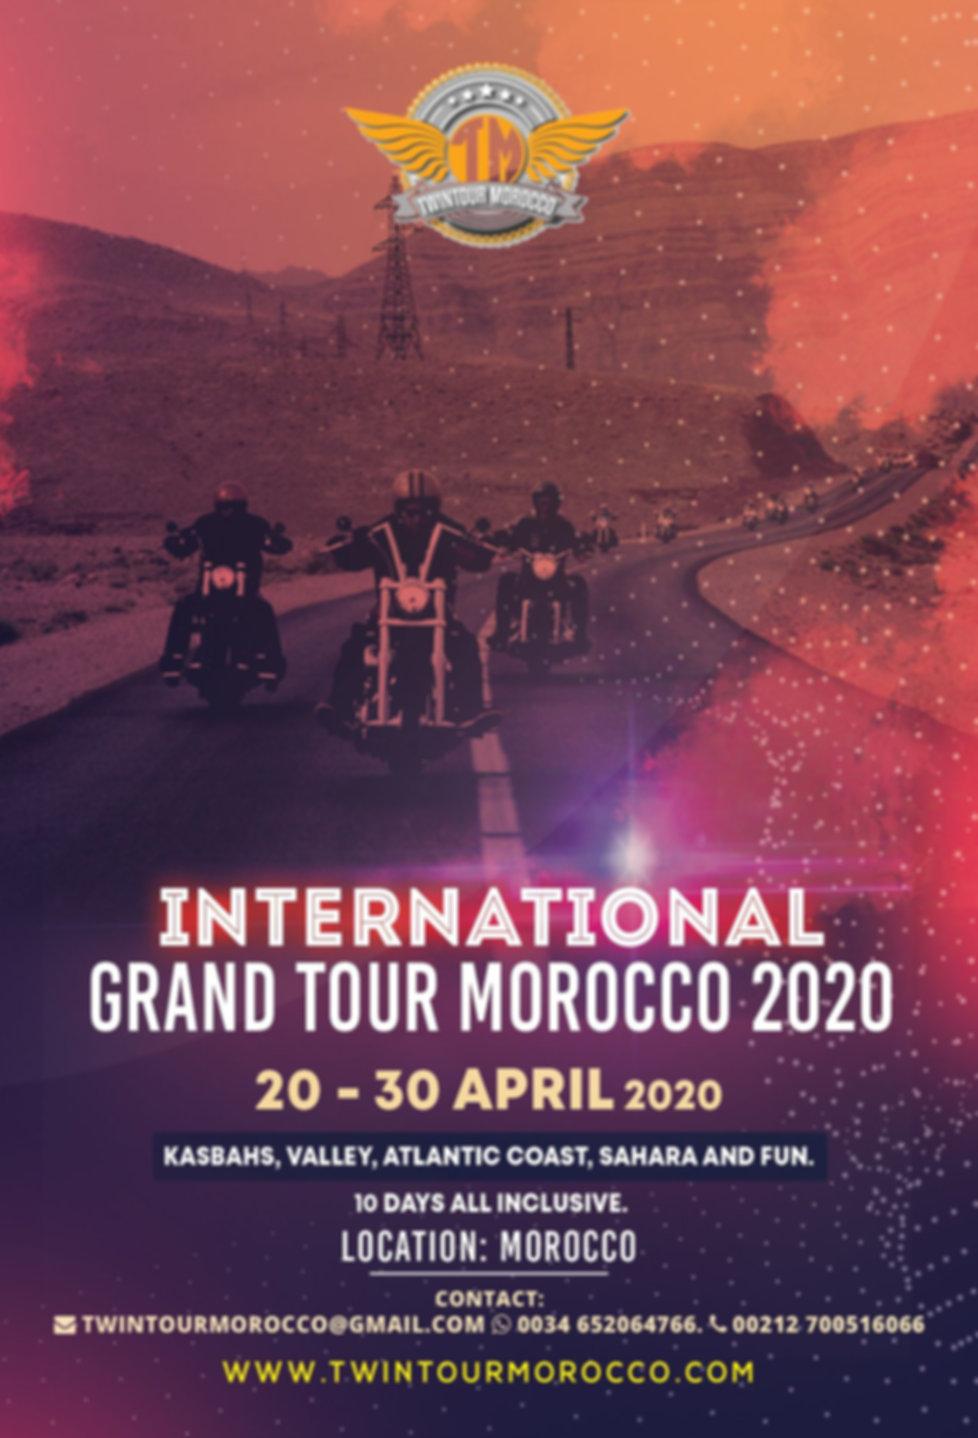 Twintour-Morocco Iternational grand tour